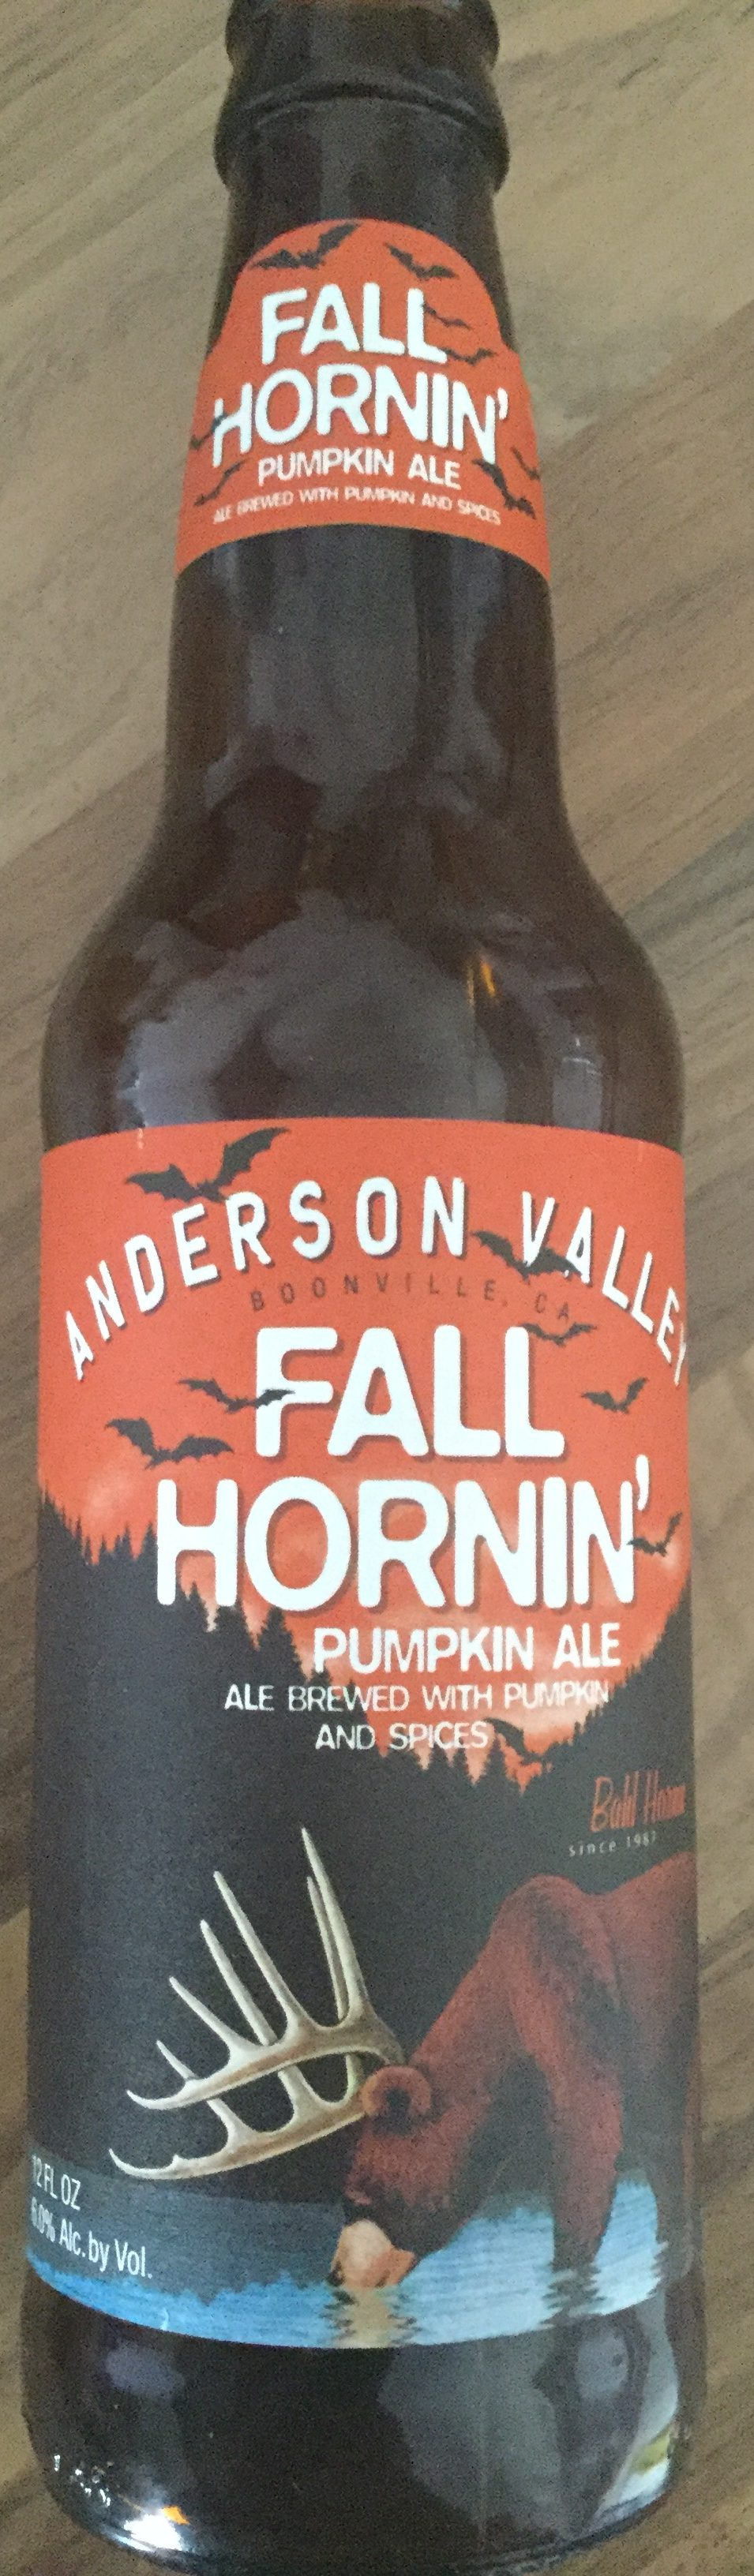 Fall Hornin' pumpkin ale - Product